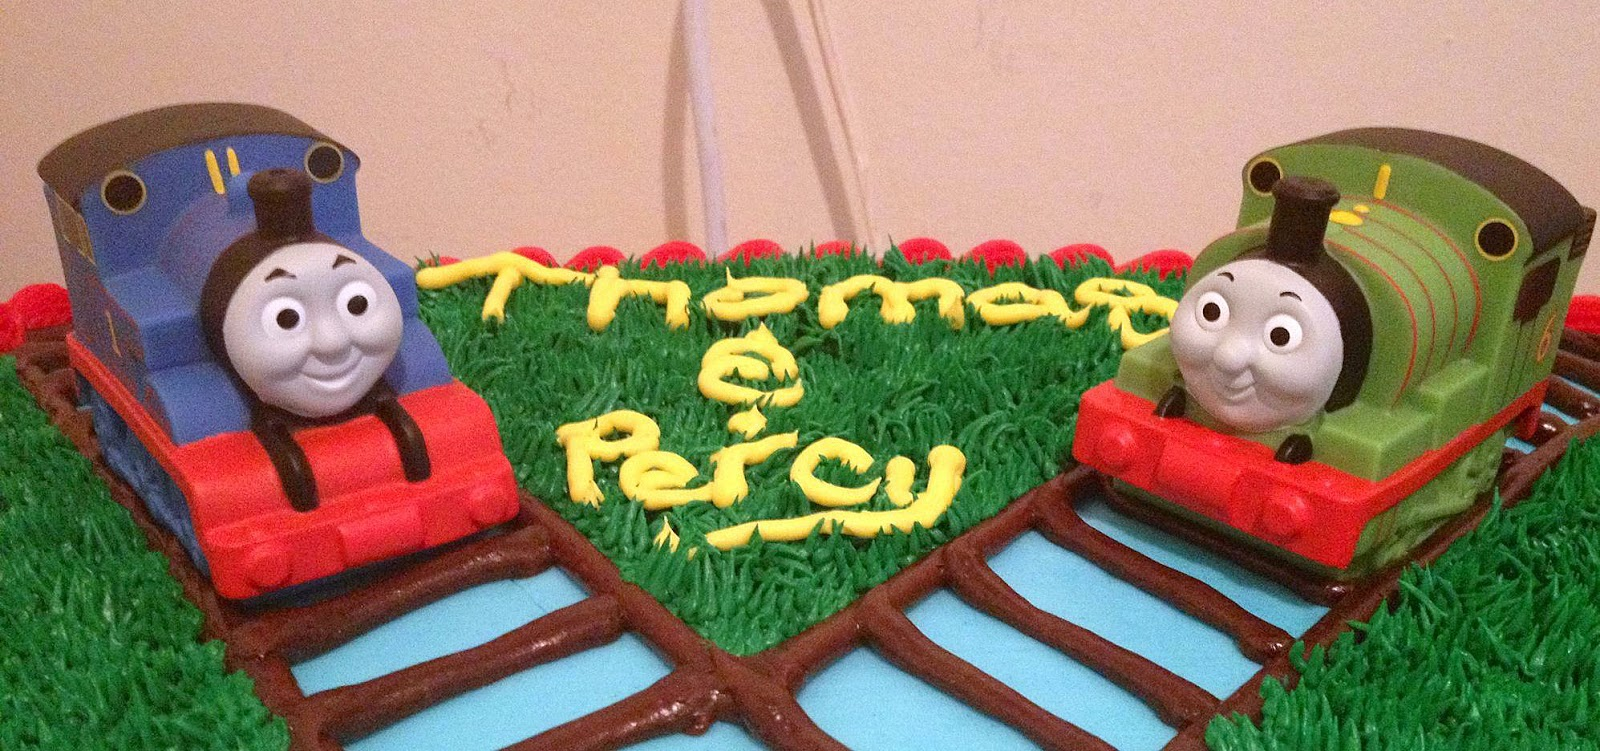 Babycake\'s Bake Shop: Austin\'s Thomas & Friends Cake